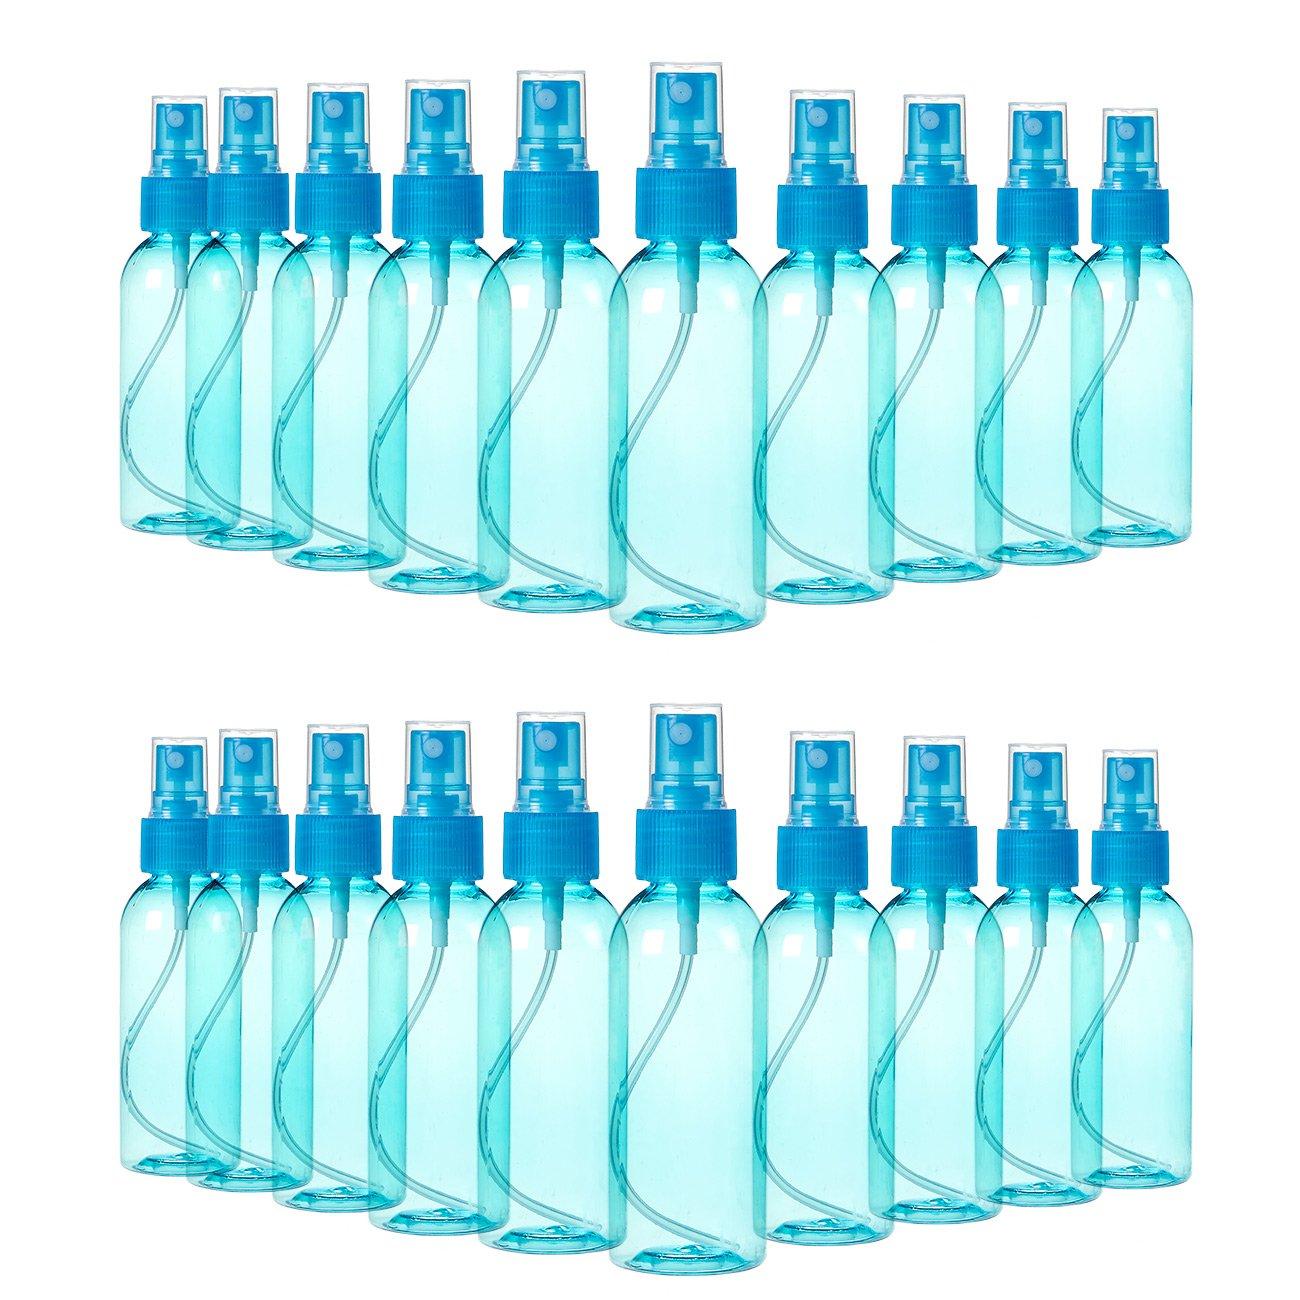 Juvale Fine Mist Mini Spray Bottles Atomizer Pumps Essential Oils, Travel, Perfumes, More - Empty Tinted Blue Plastic Bottles - Refillable & Reusable - 20 Piece Set - 80ml